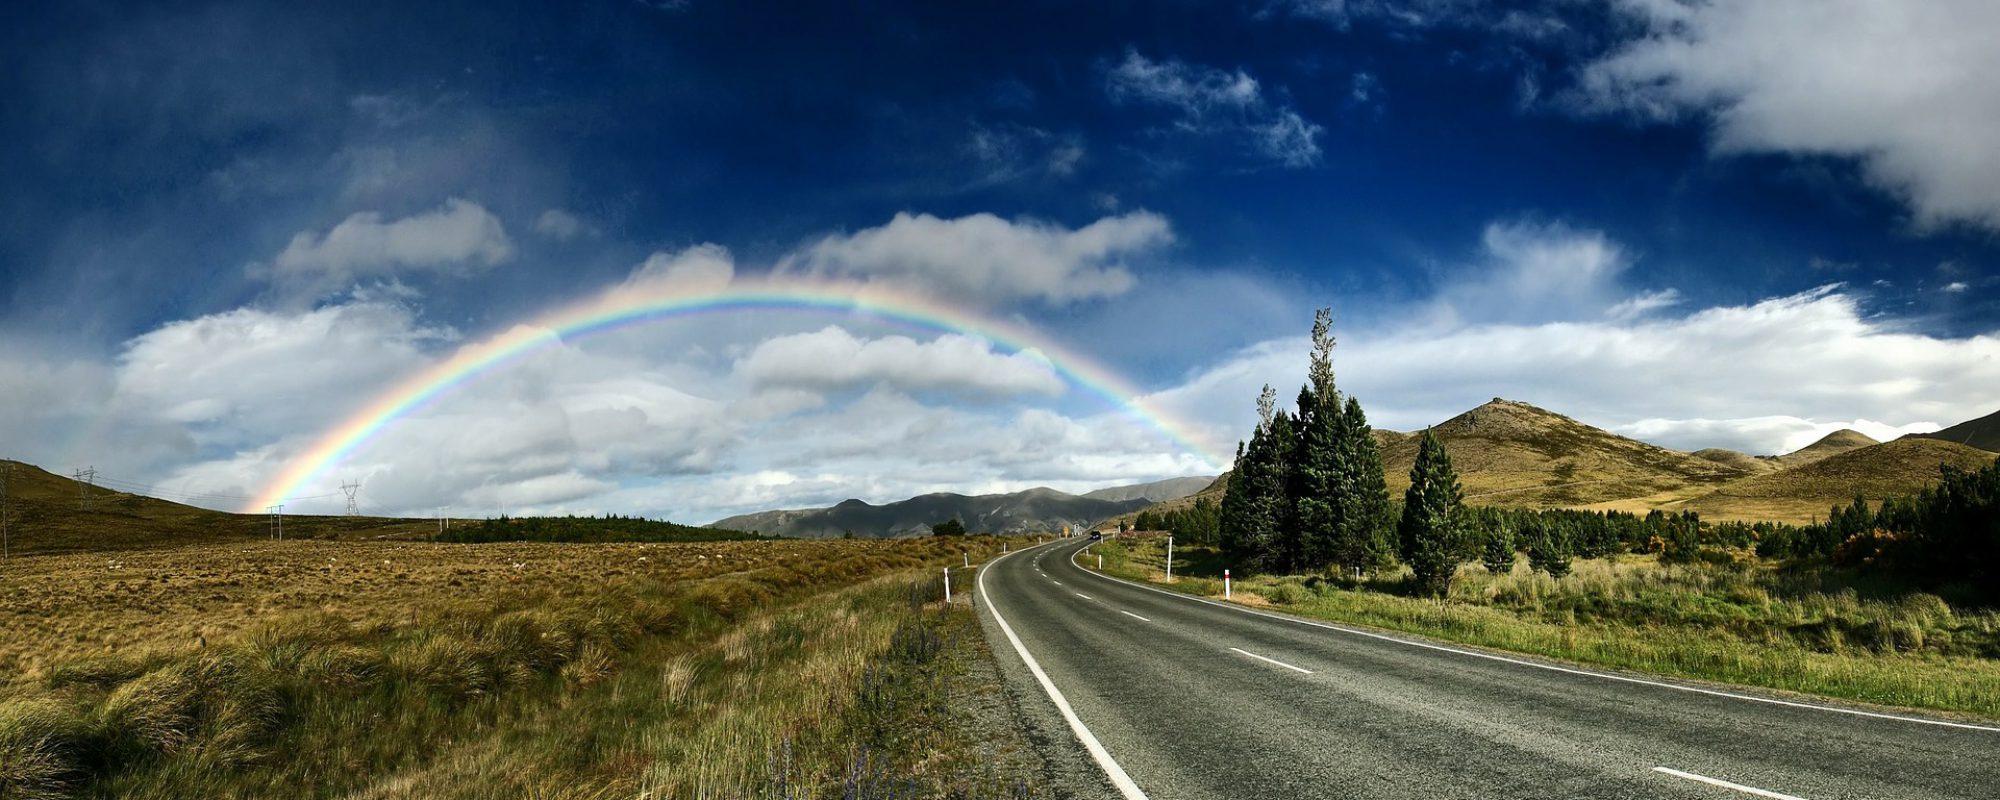 cropped-rainbow-background-1149610_1920.jpg